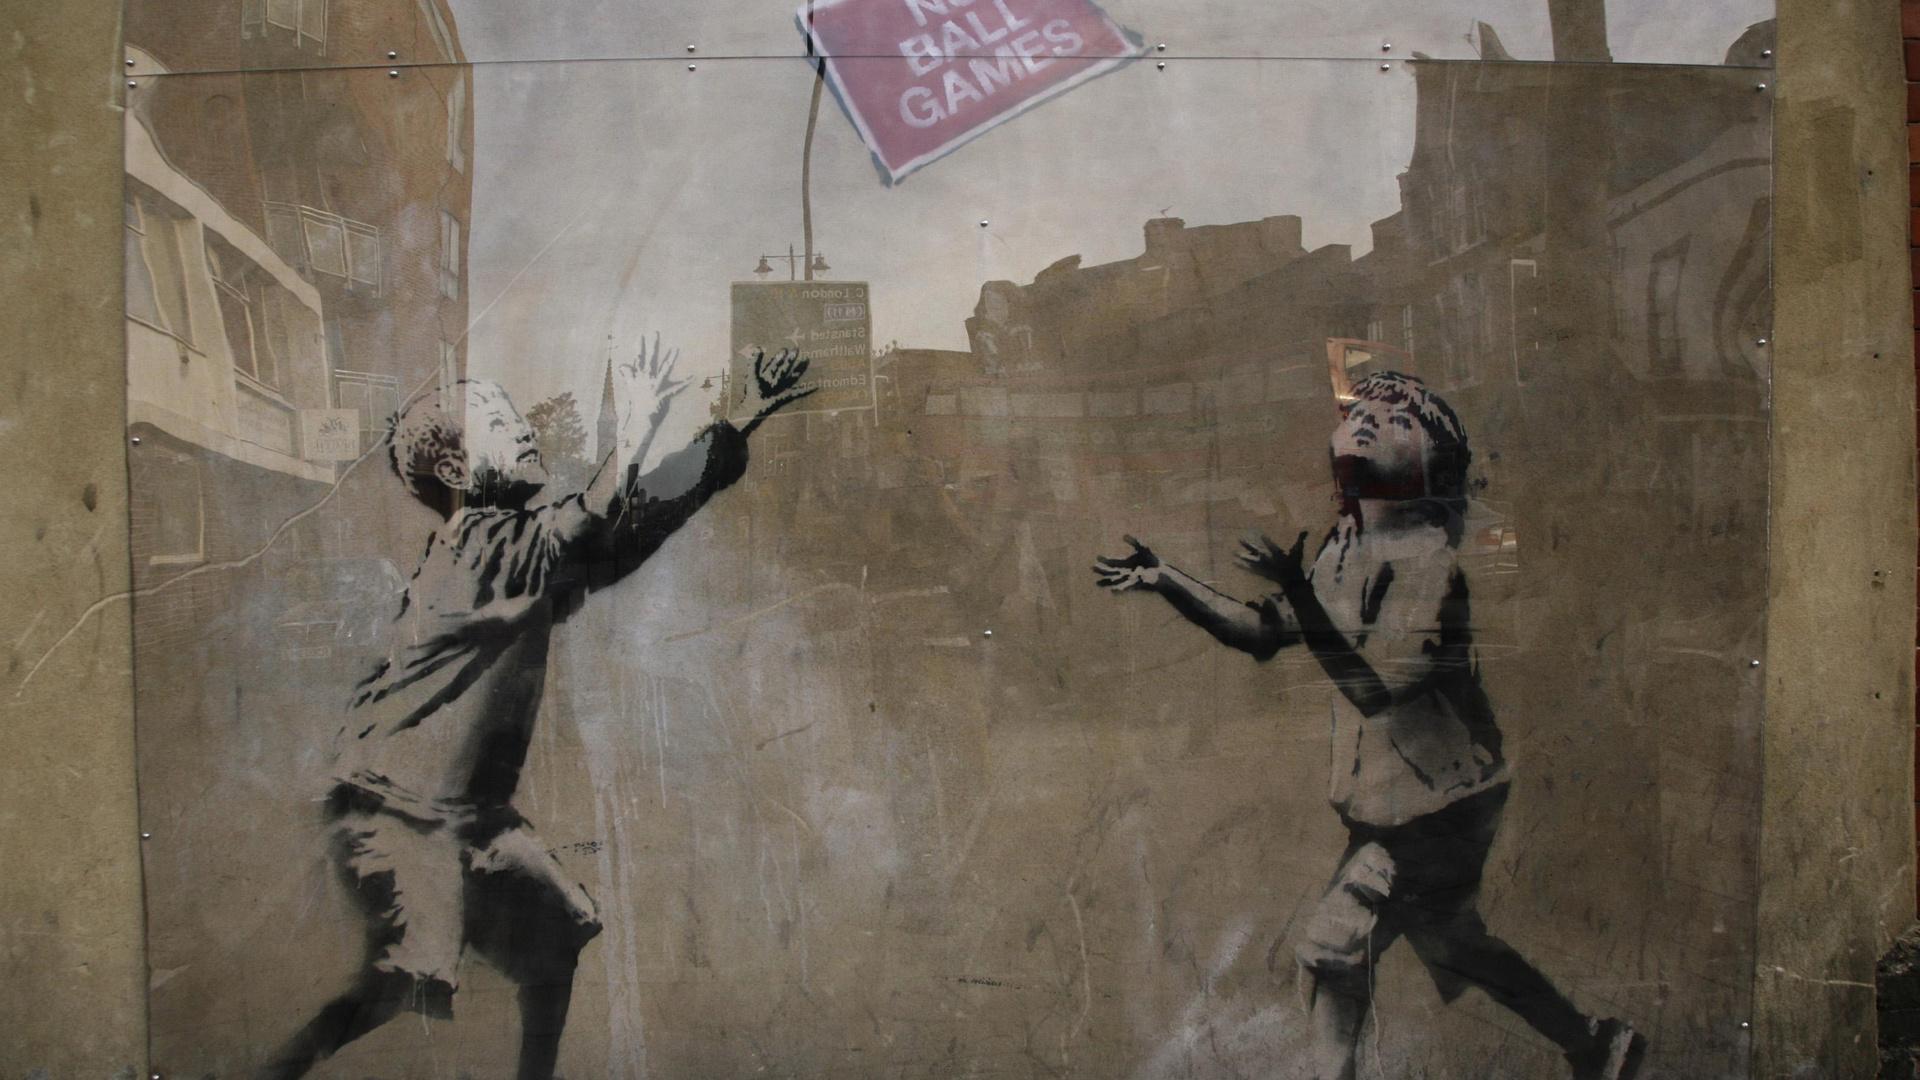 1920x1080 Banksy Street Art Graffiti No Ball Games